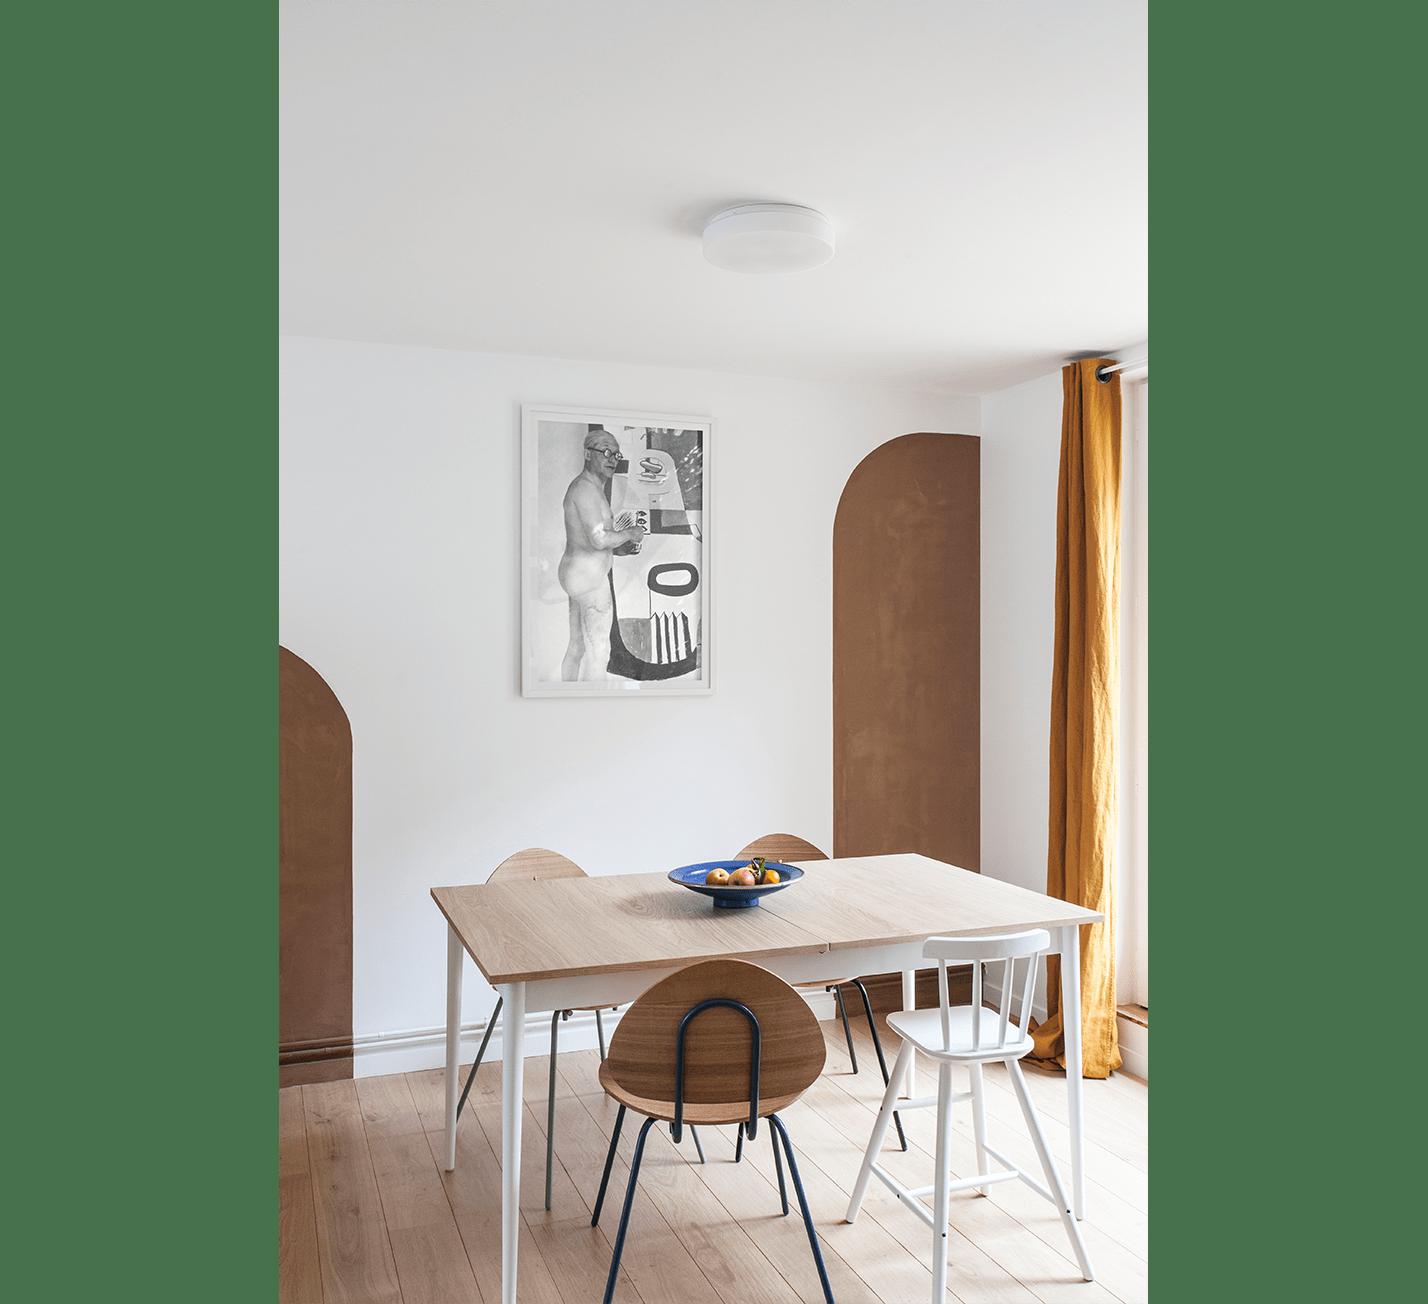 Projet-Germaine-Atelier-Steve-Pauline-Borgia-Architecte-interieur-02-min